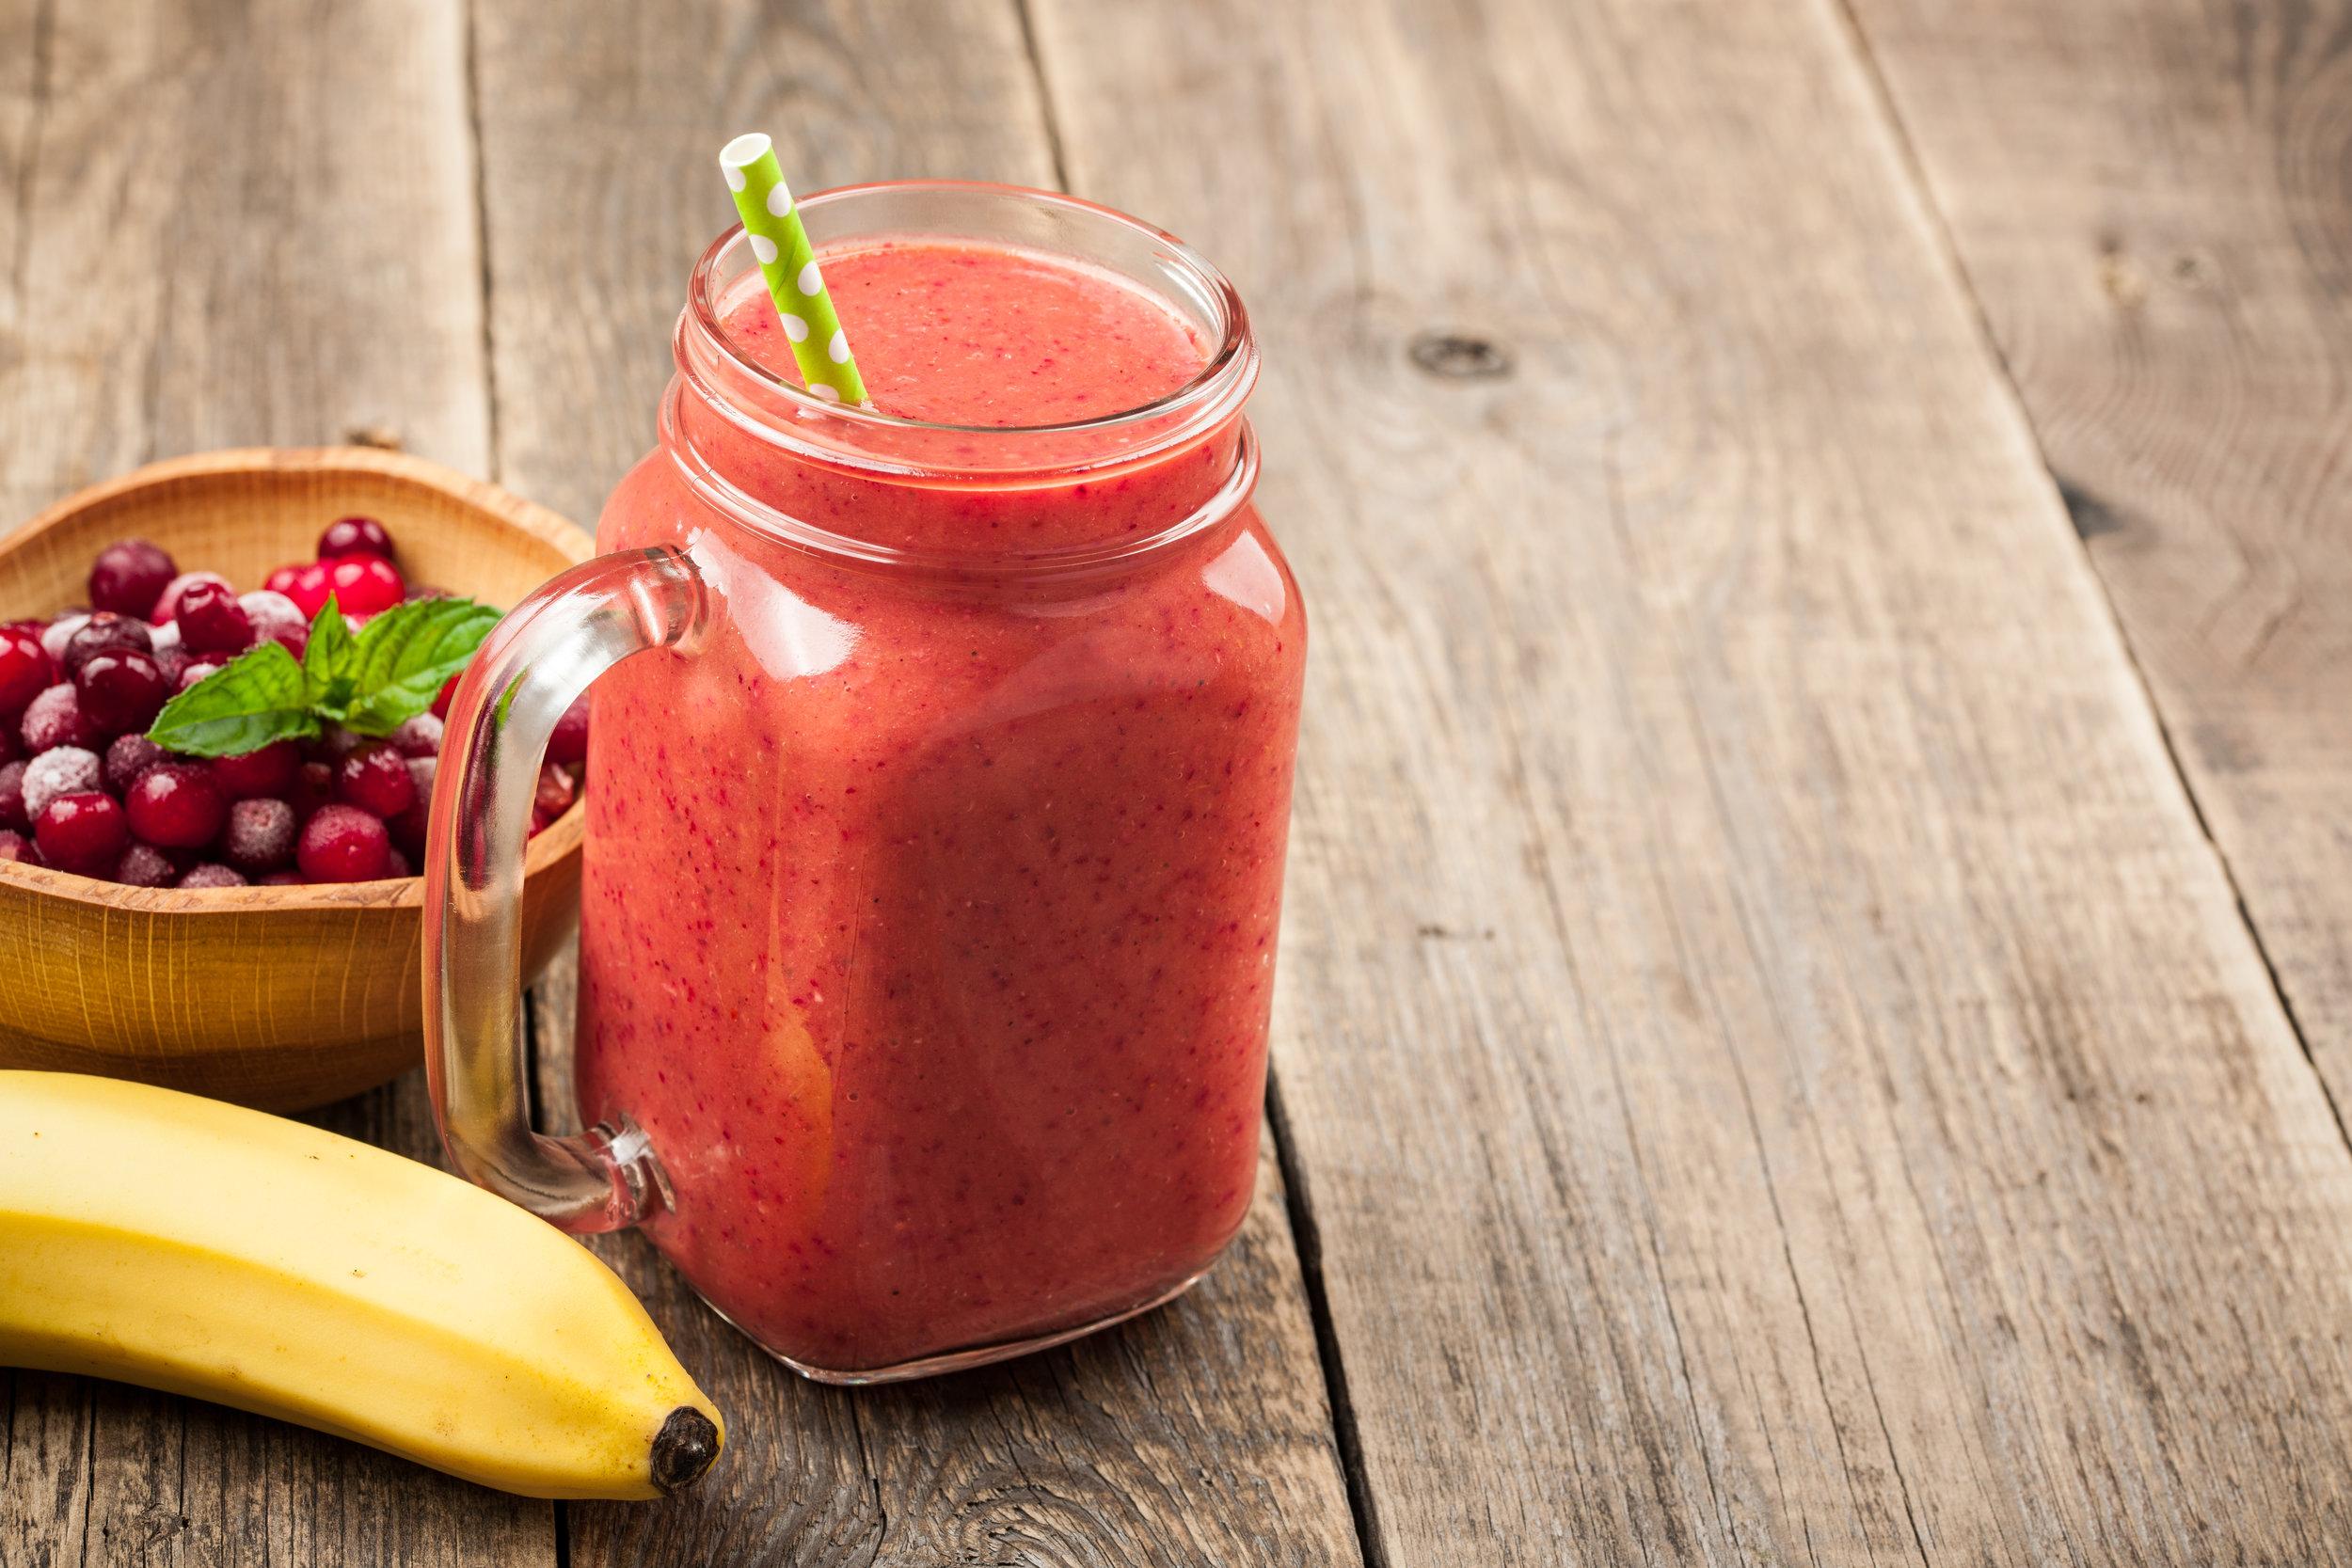 banana-cranberry-smoothie-mug-and-ingredients-on-PL8Z99S.jpg